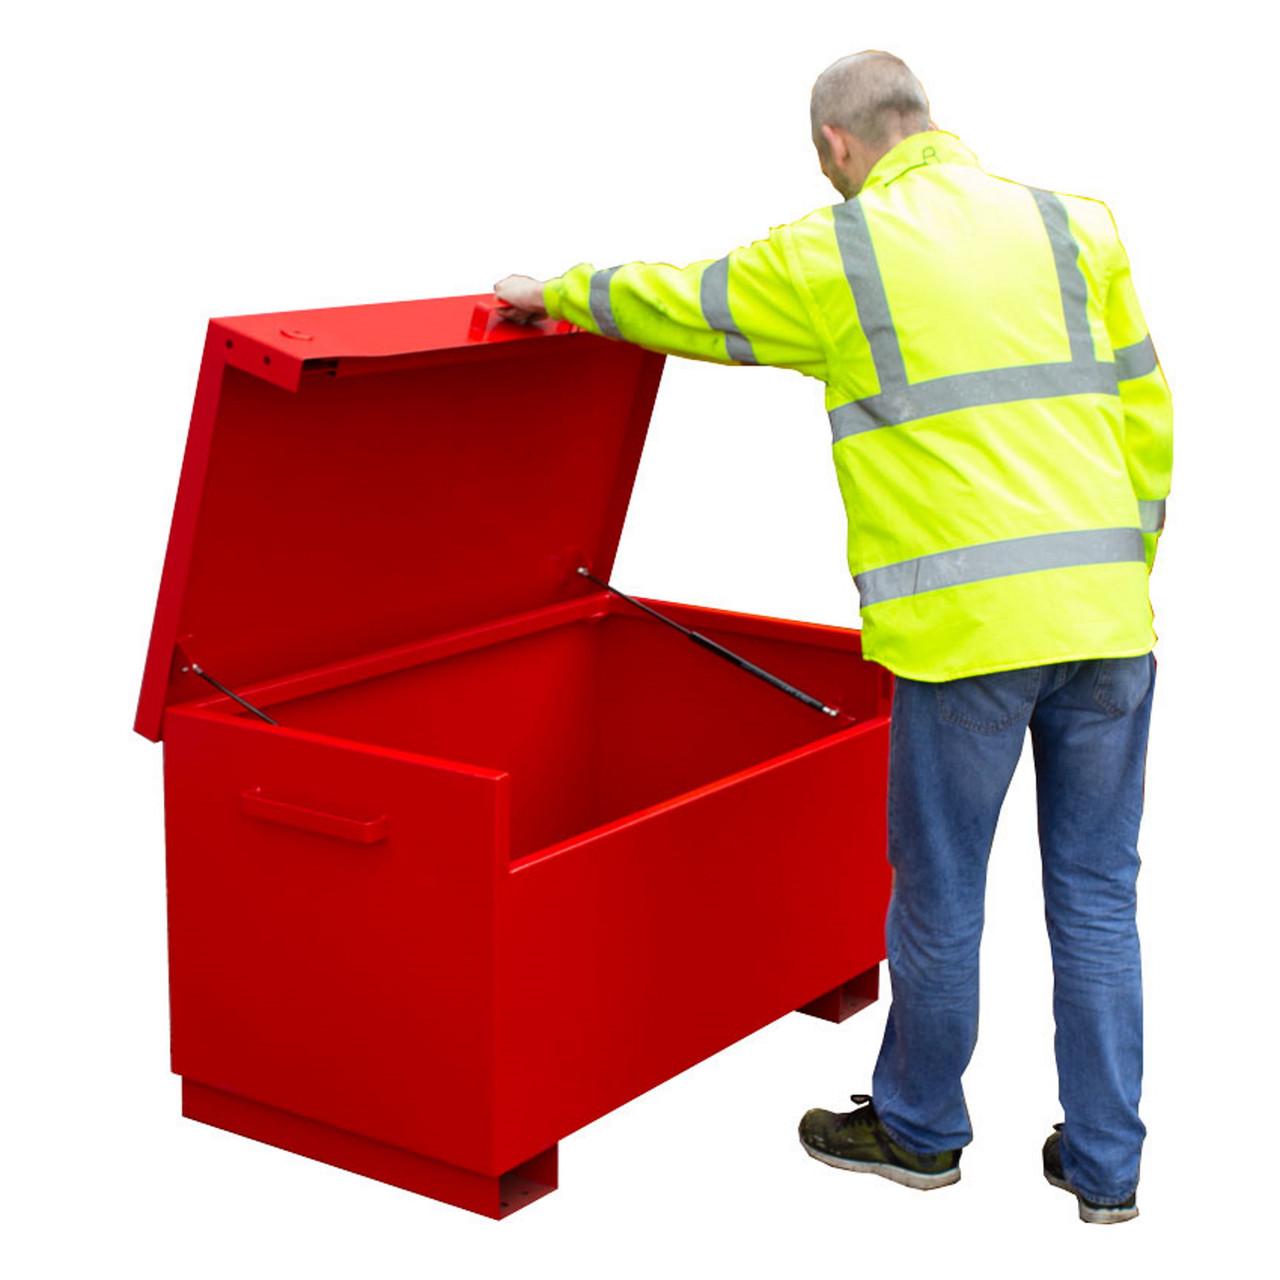 CS8 Chemstor Storage Box 1208mm x 675mm x 690mm